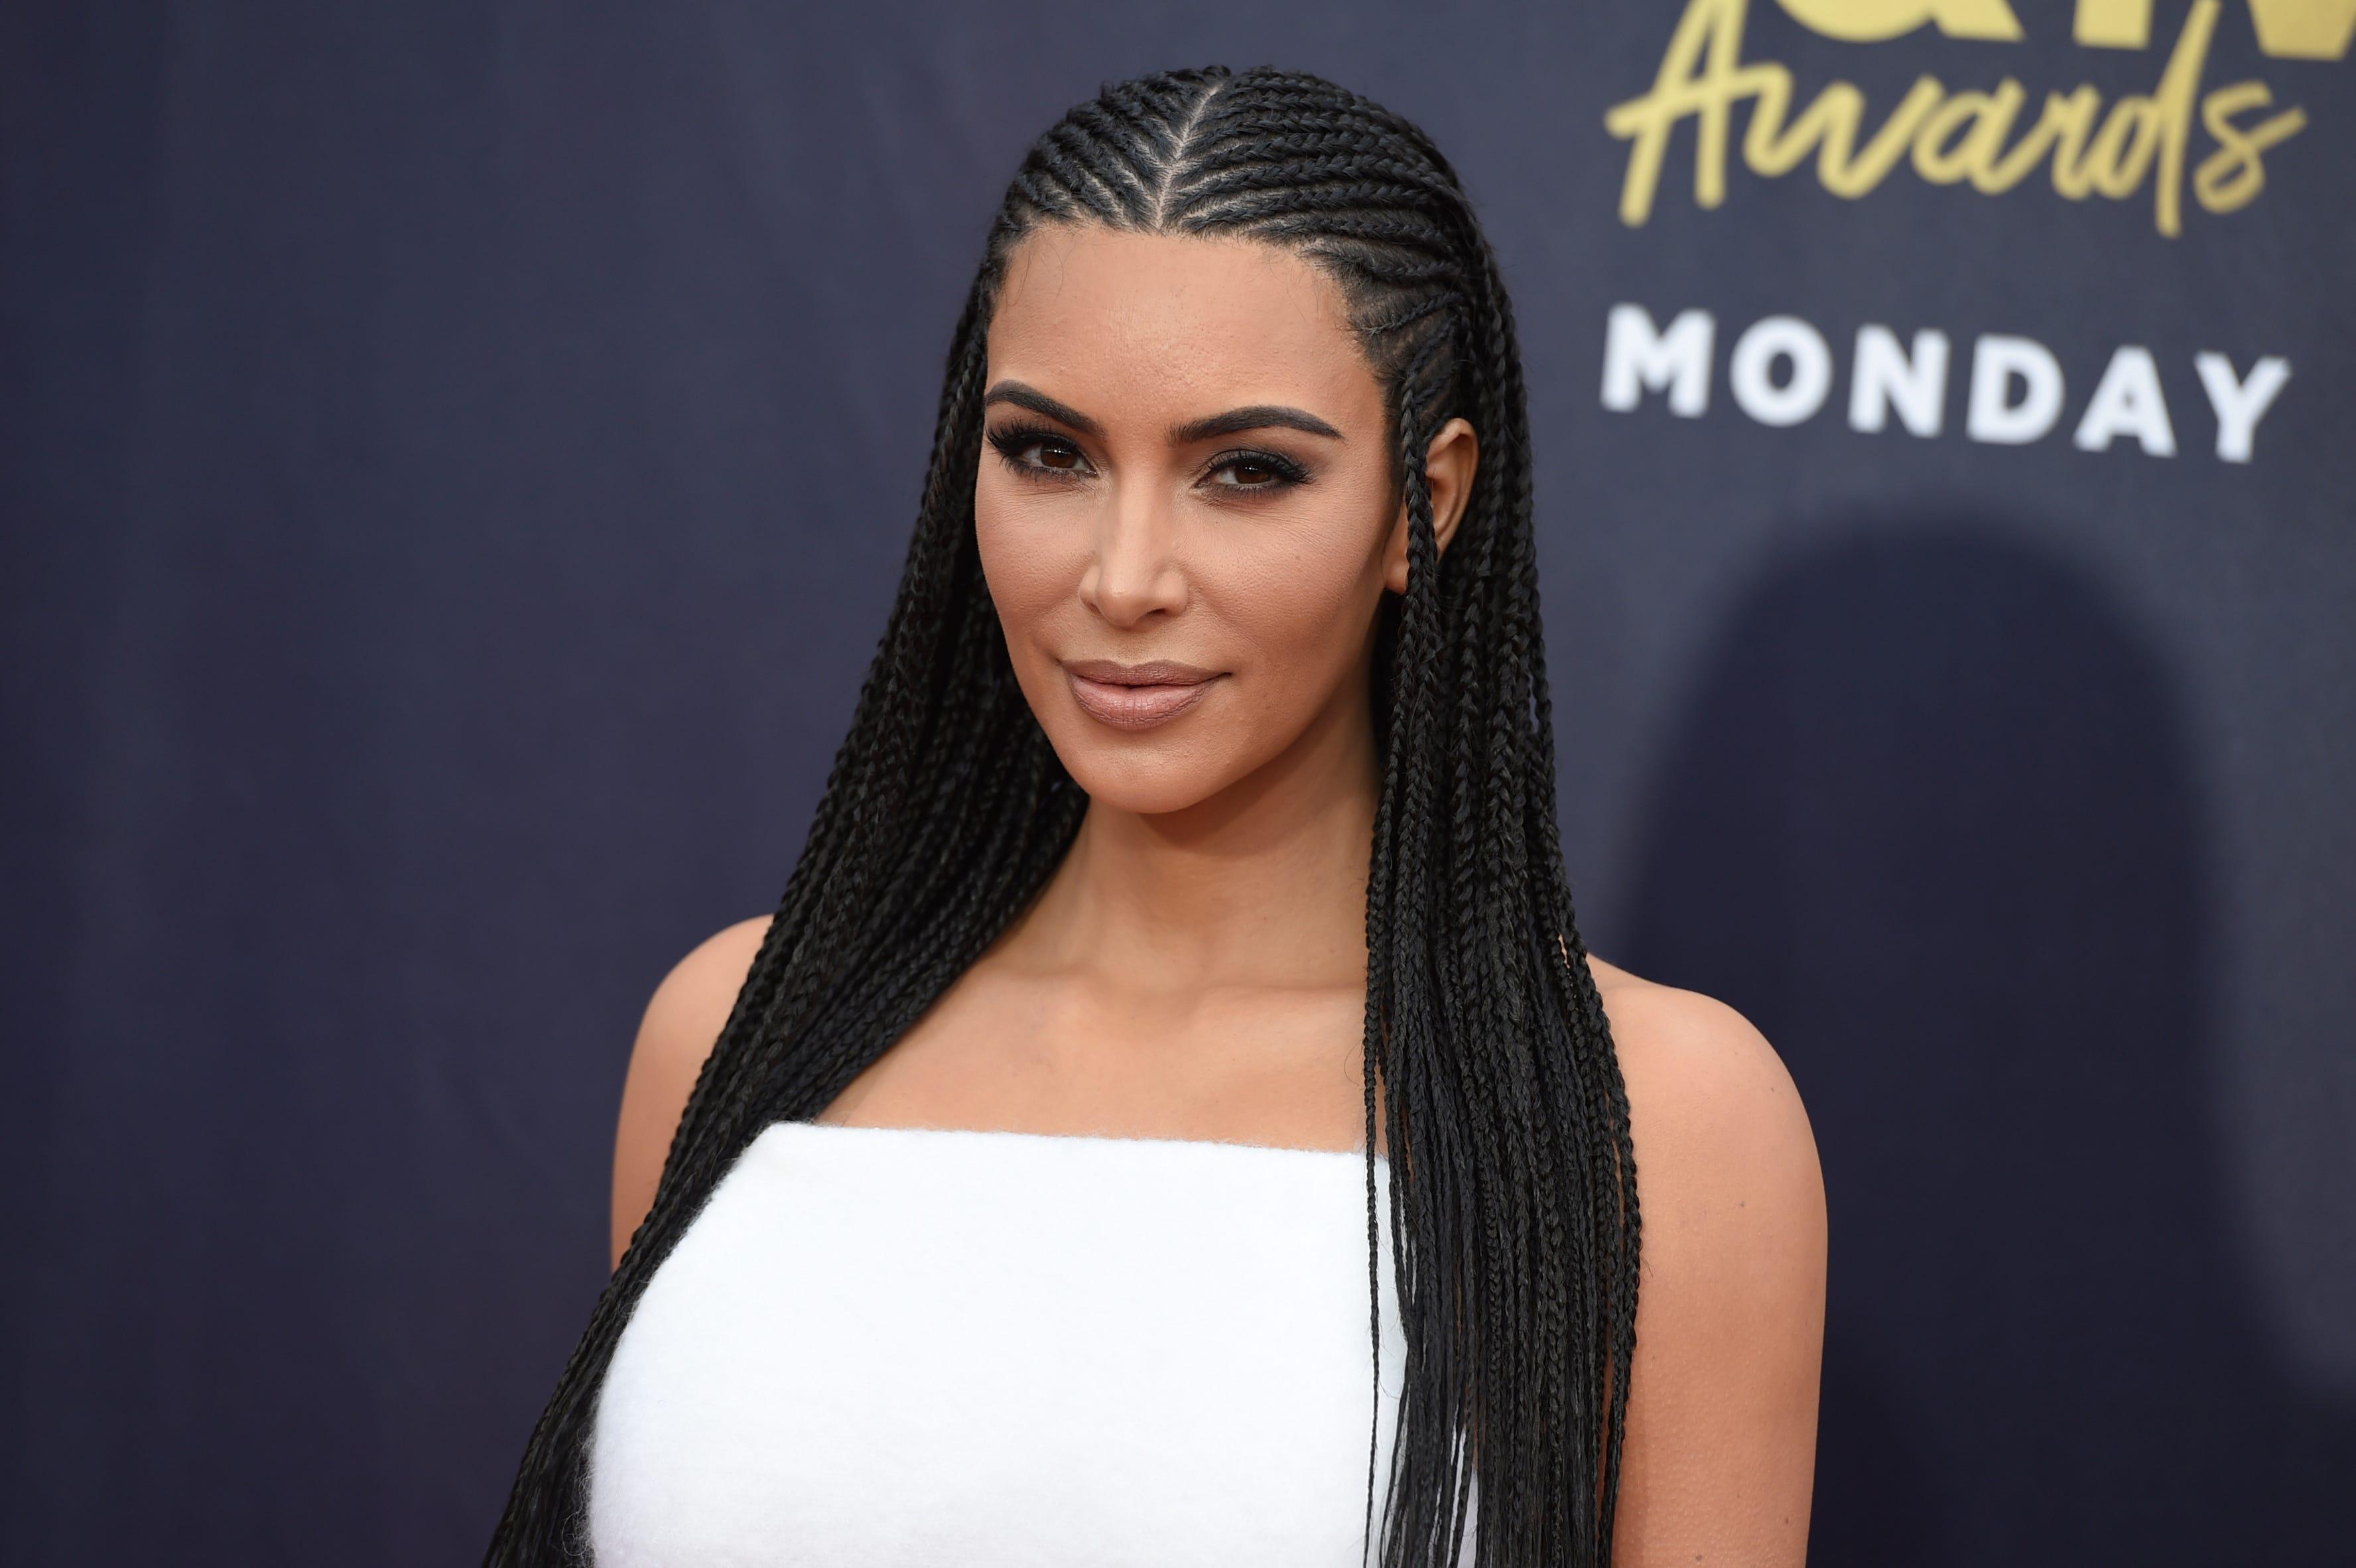 Kim Kardashian West facing backlash for her Tyson Beckford clap back